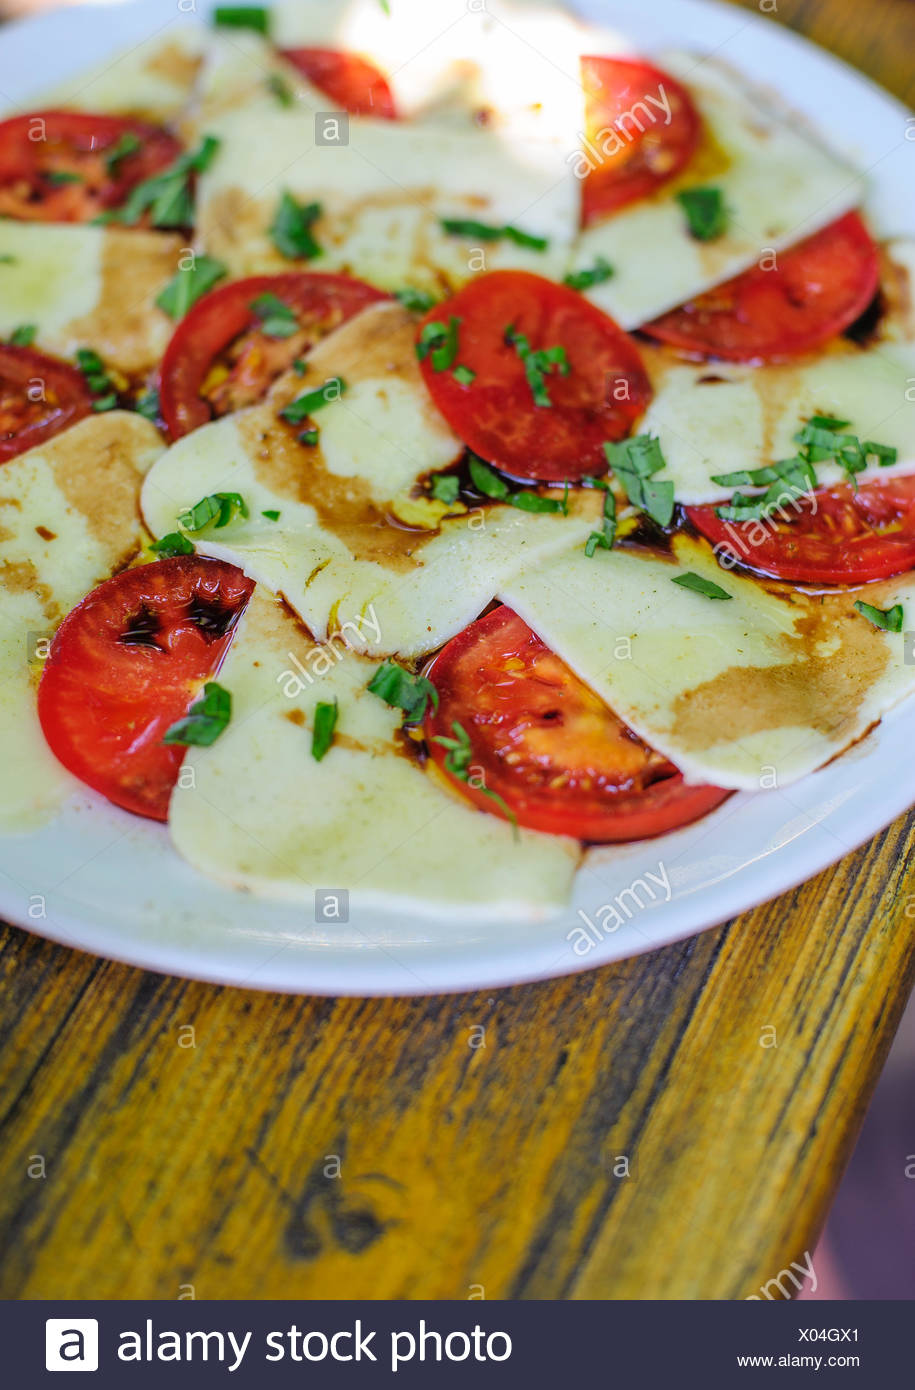 Tomatoe and Mozzarella - Stock Image